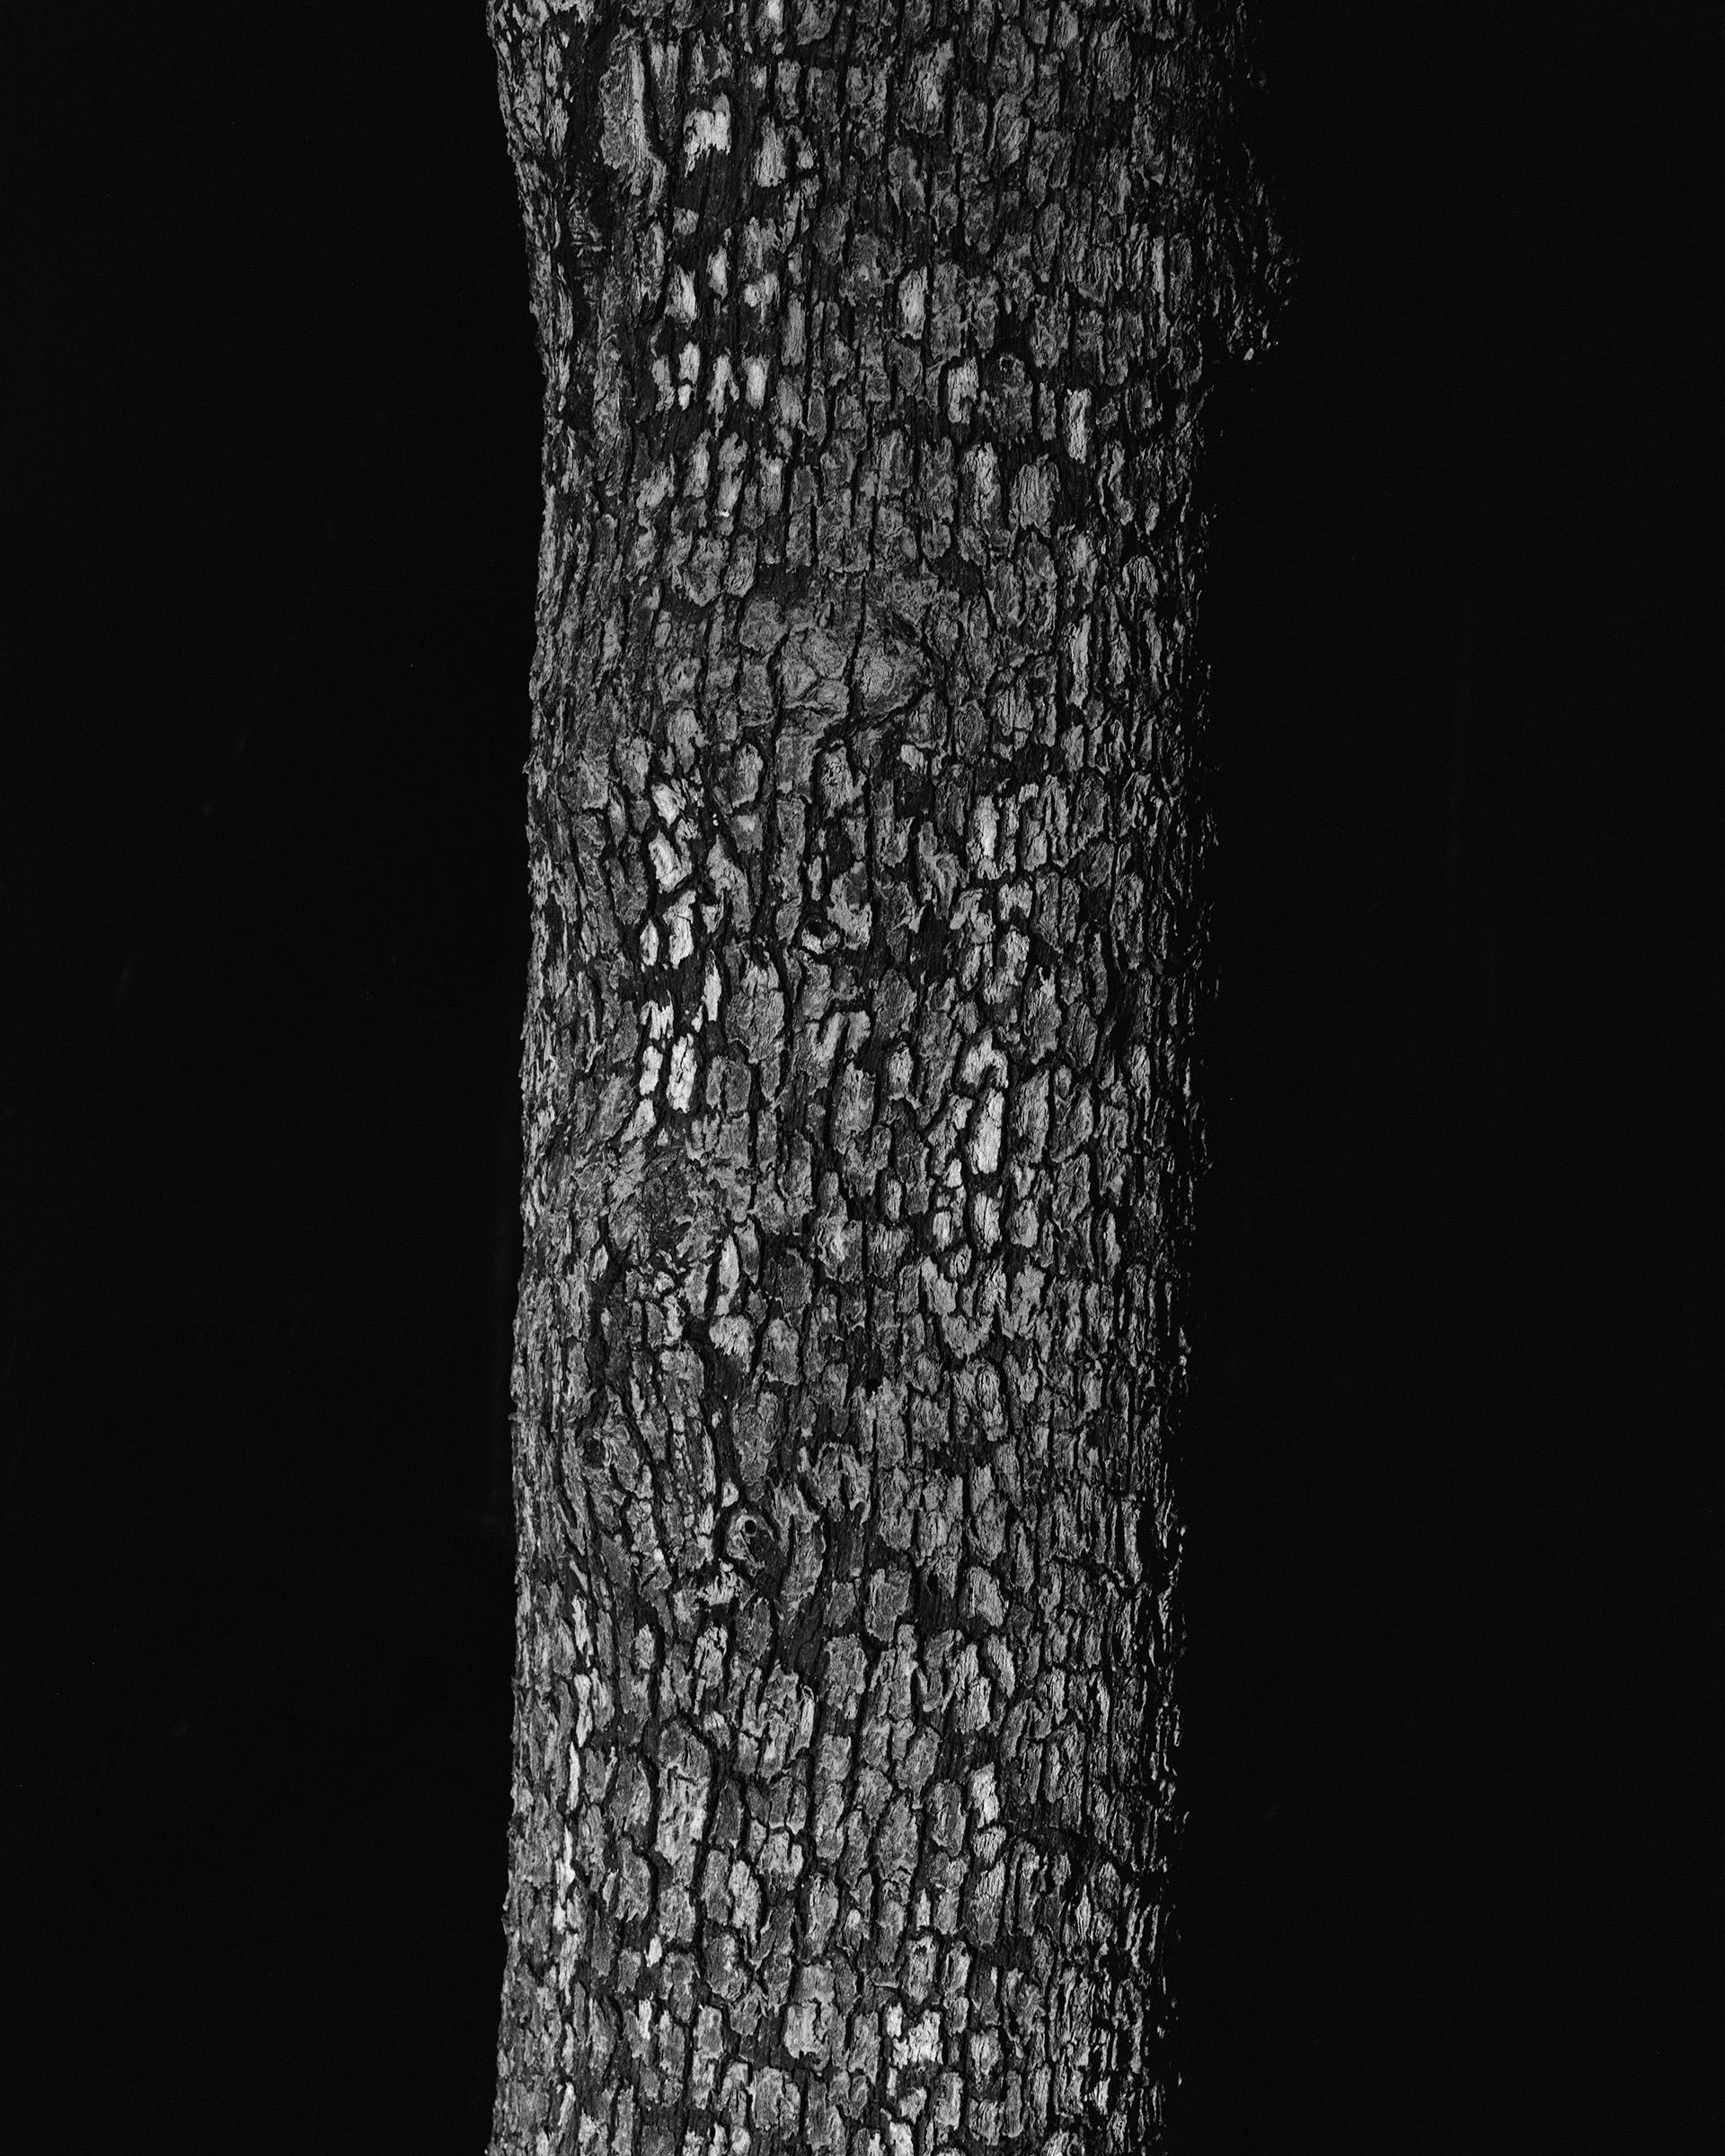 Fire_Tree_closeup_Print_16x20.jpg